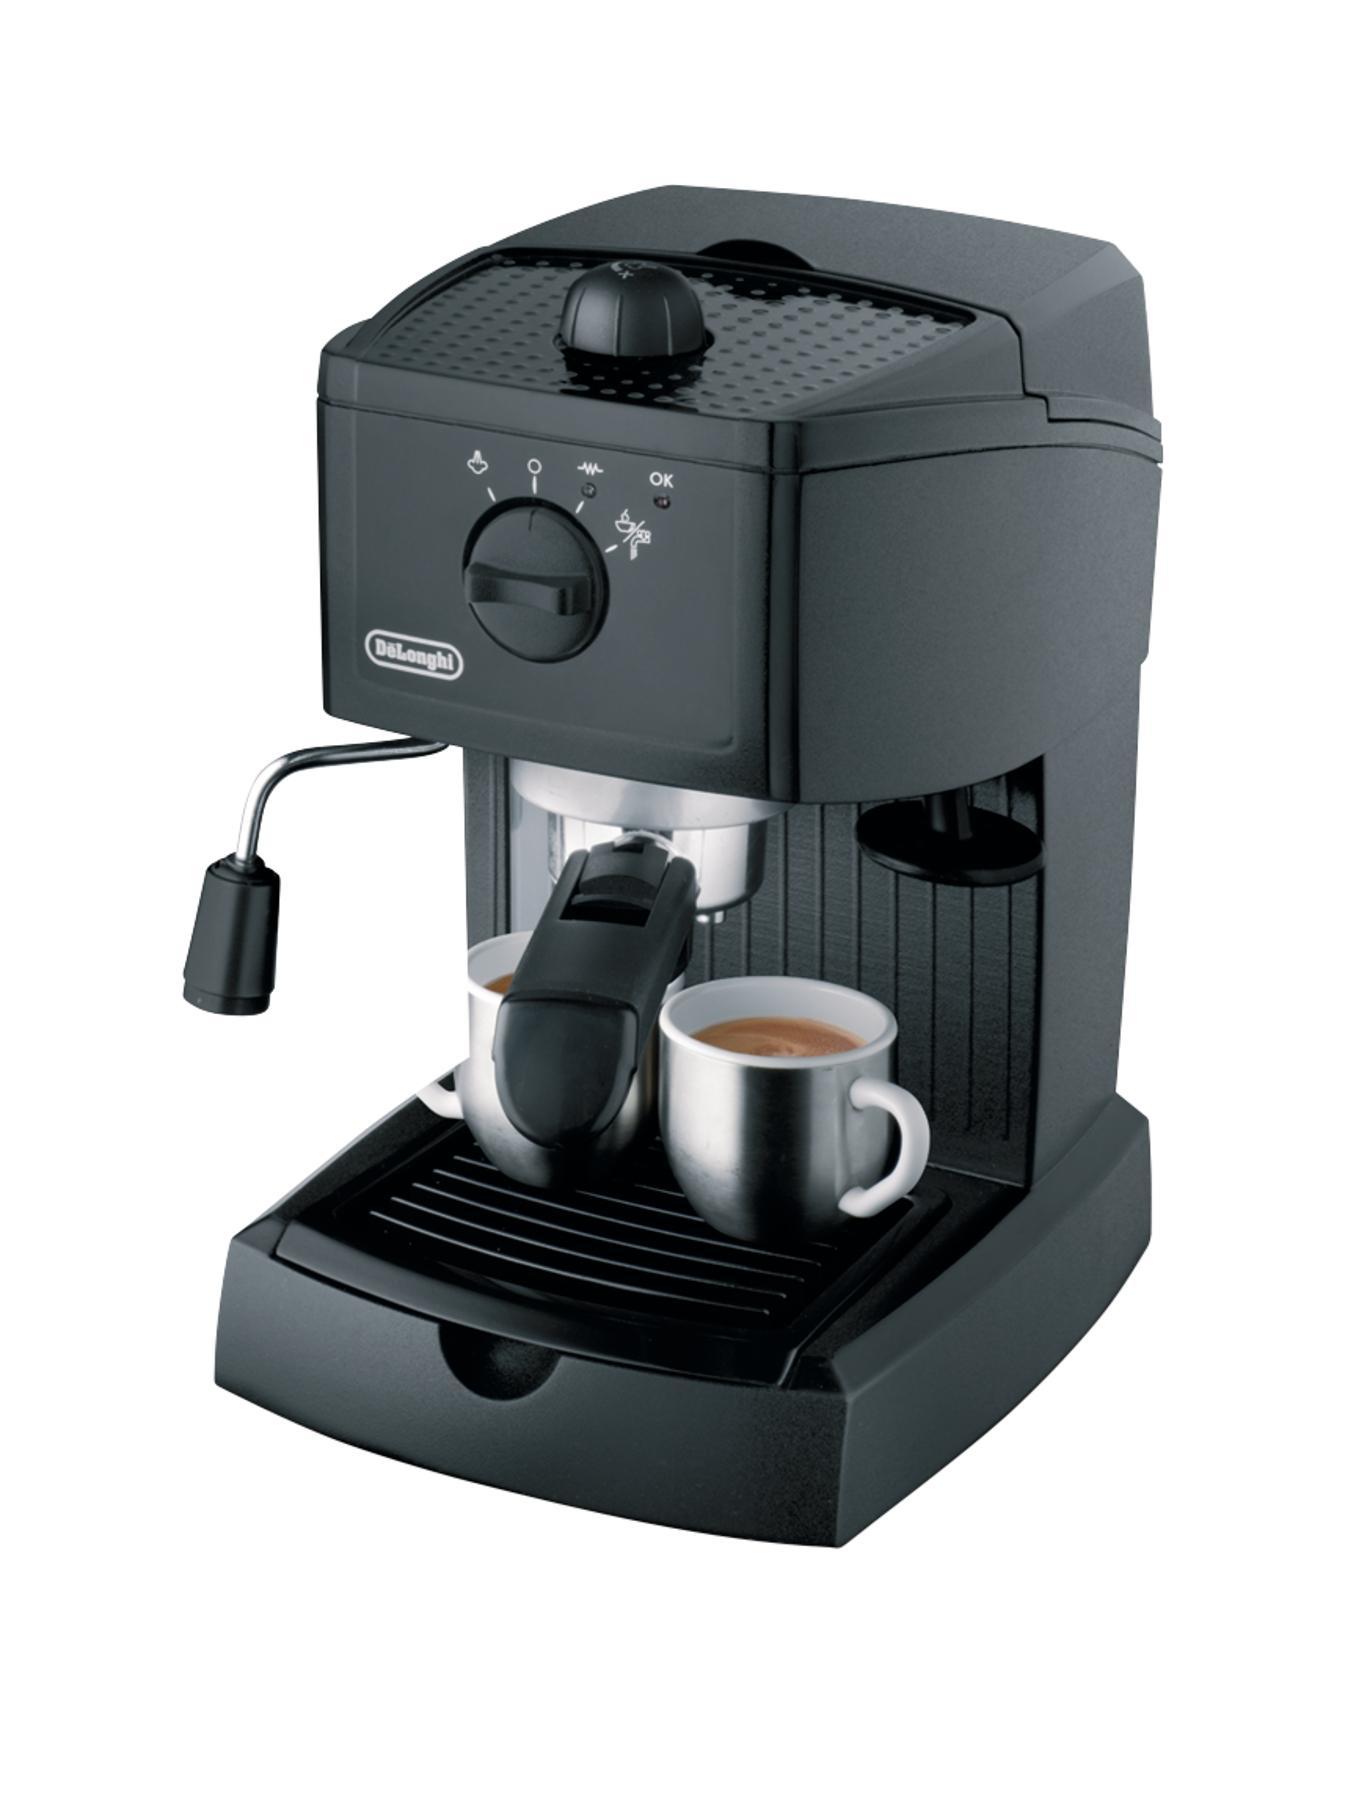 Best Coffee Maker For Latte : EC145 Espresso and Cappuccino Maker